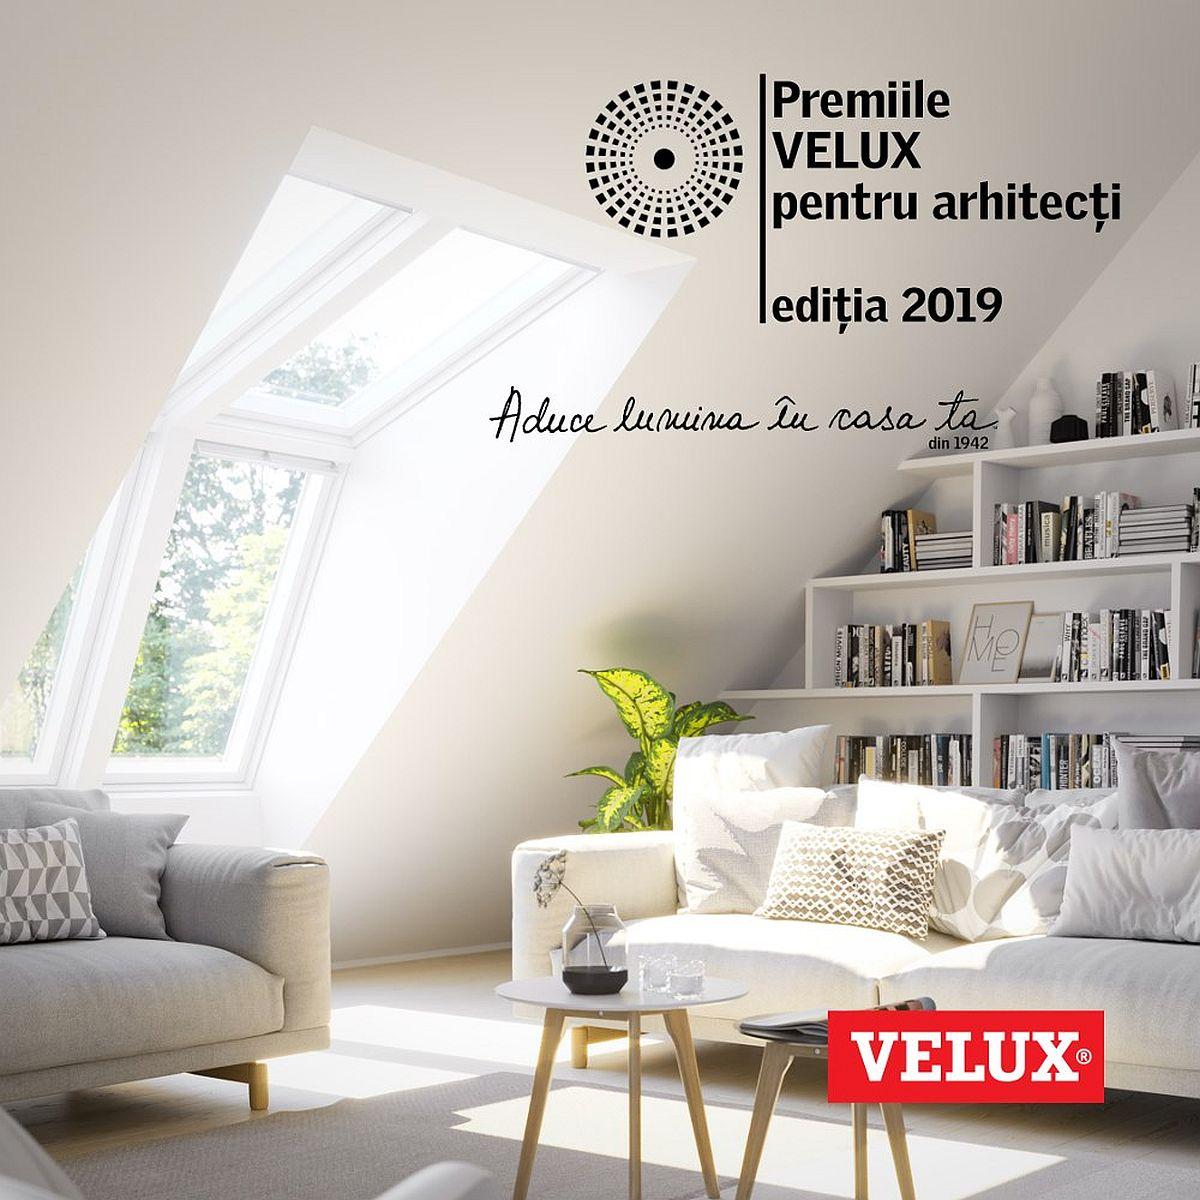 adelaparvu.com despre concurs Velux 2019 (1)